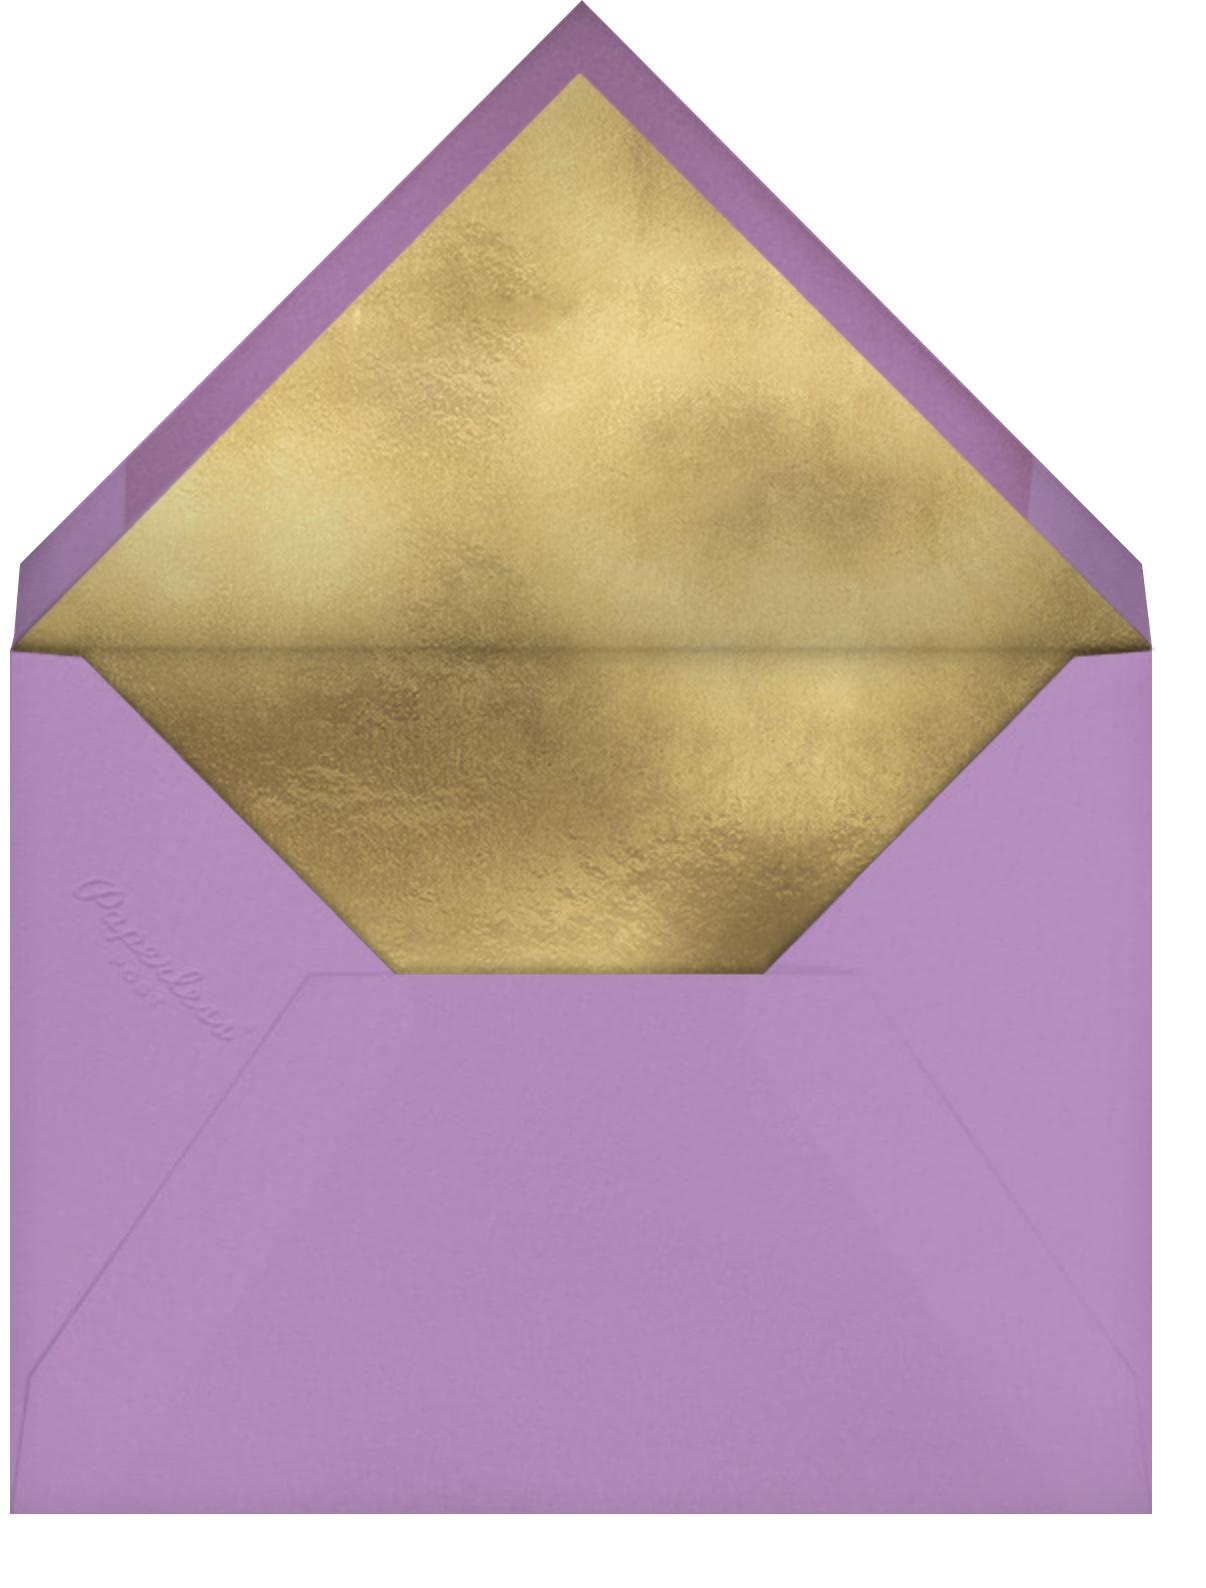 Hermoso Vestido Photo - Lilac - Paperless Post - Quinceañera - envelope back